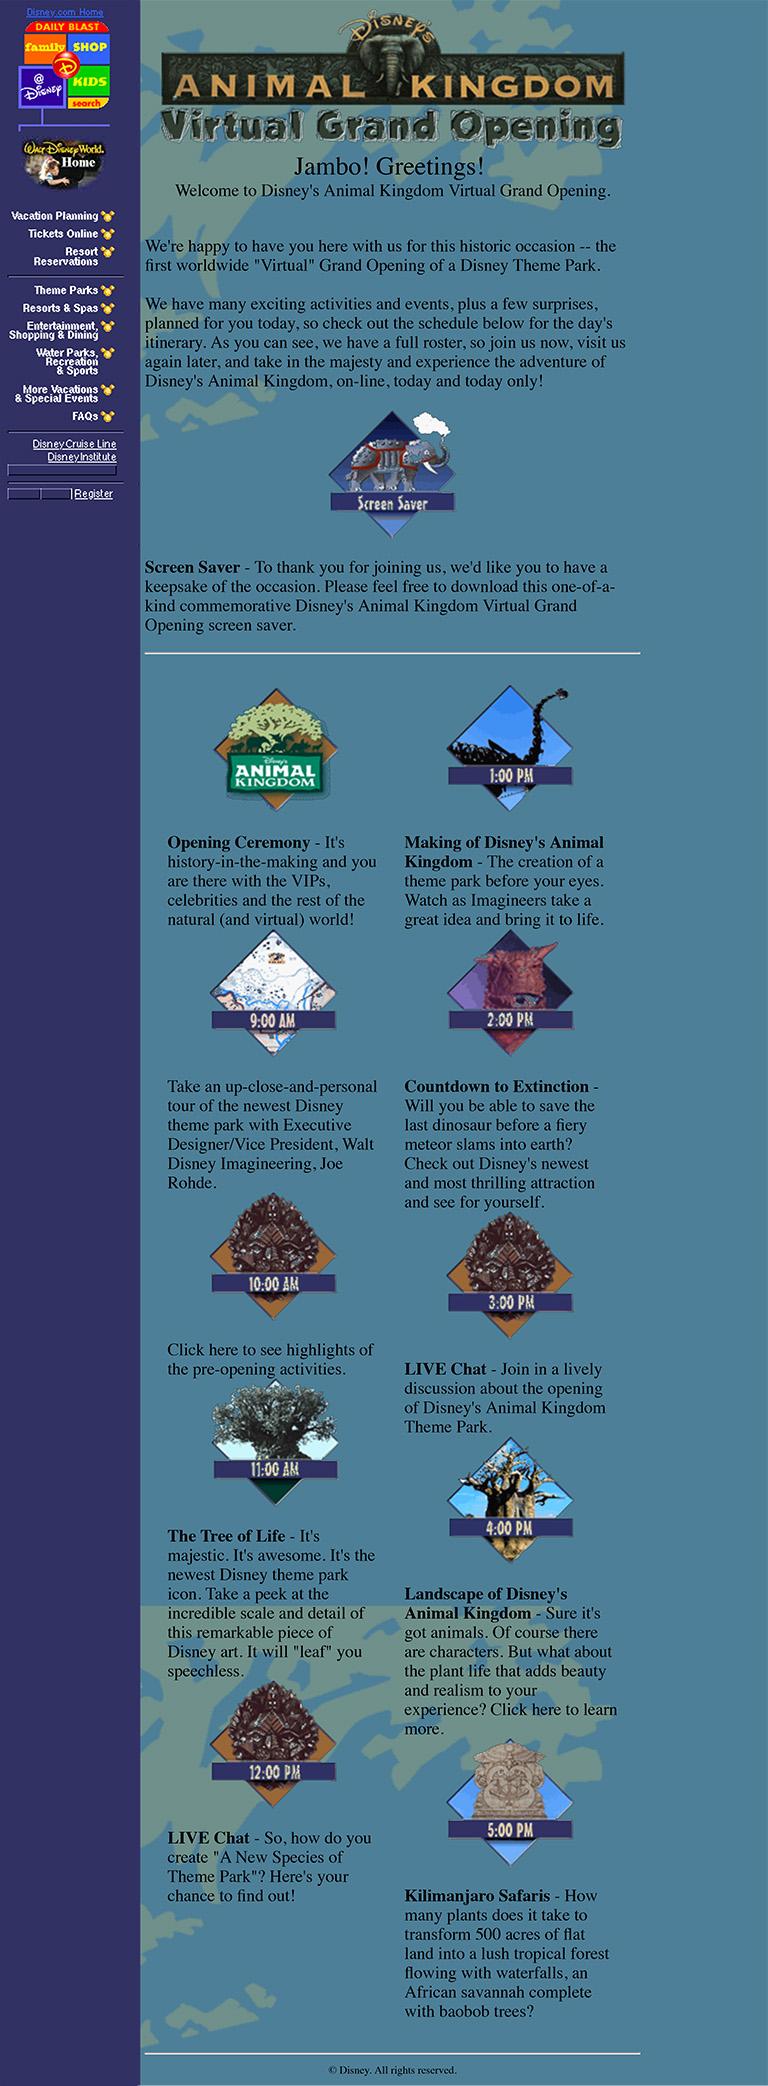 Disney's Animal Kingdom Virtual Grand Opening landing page